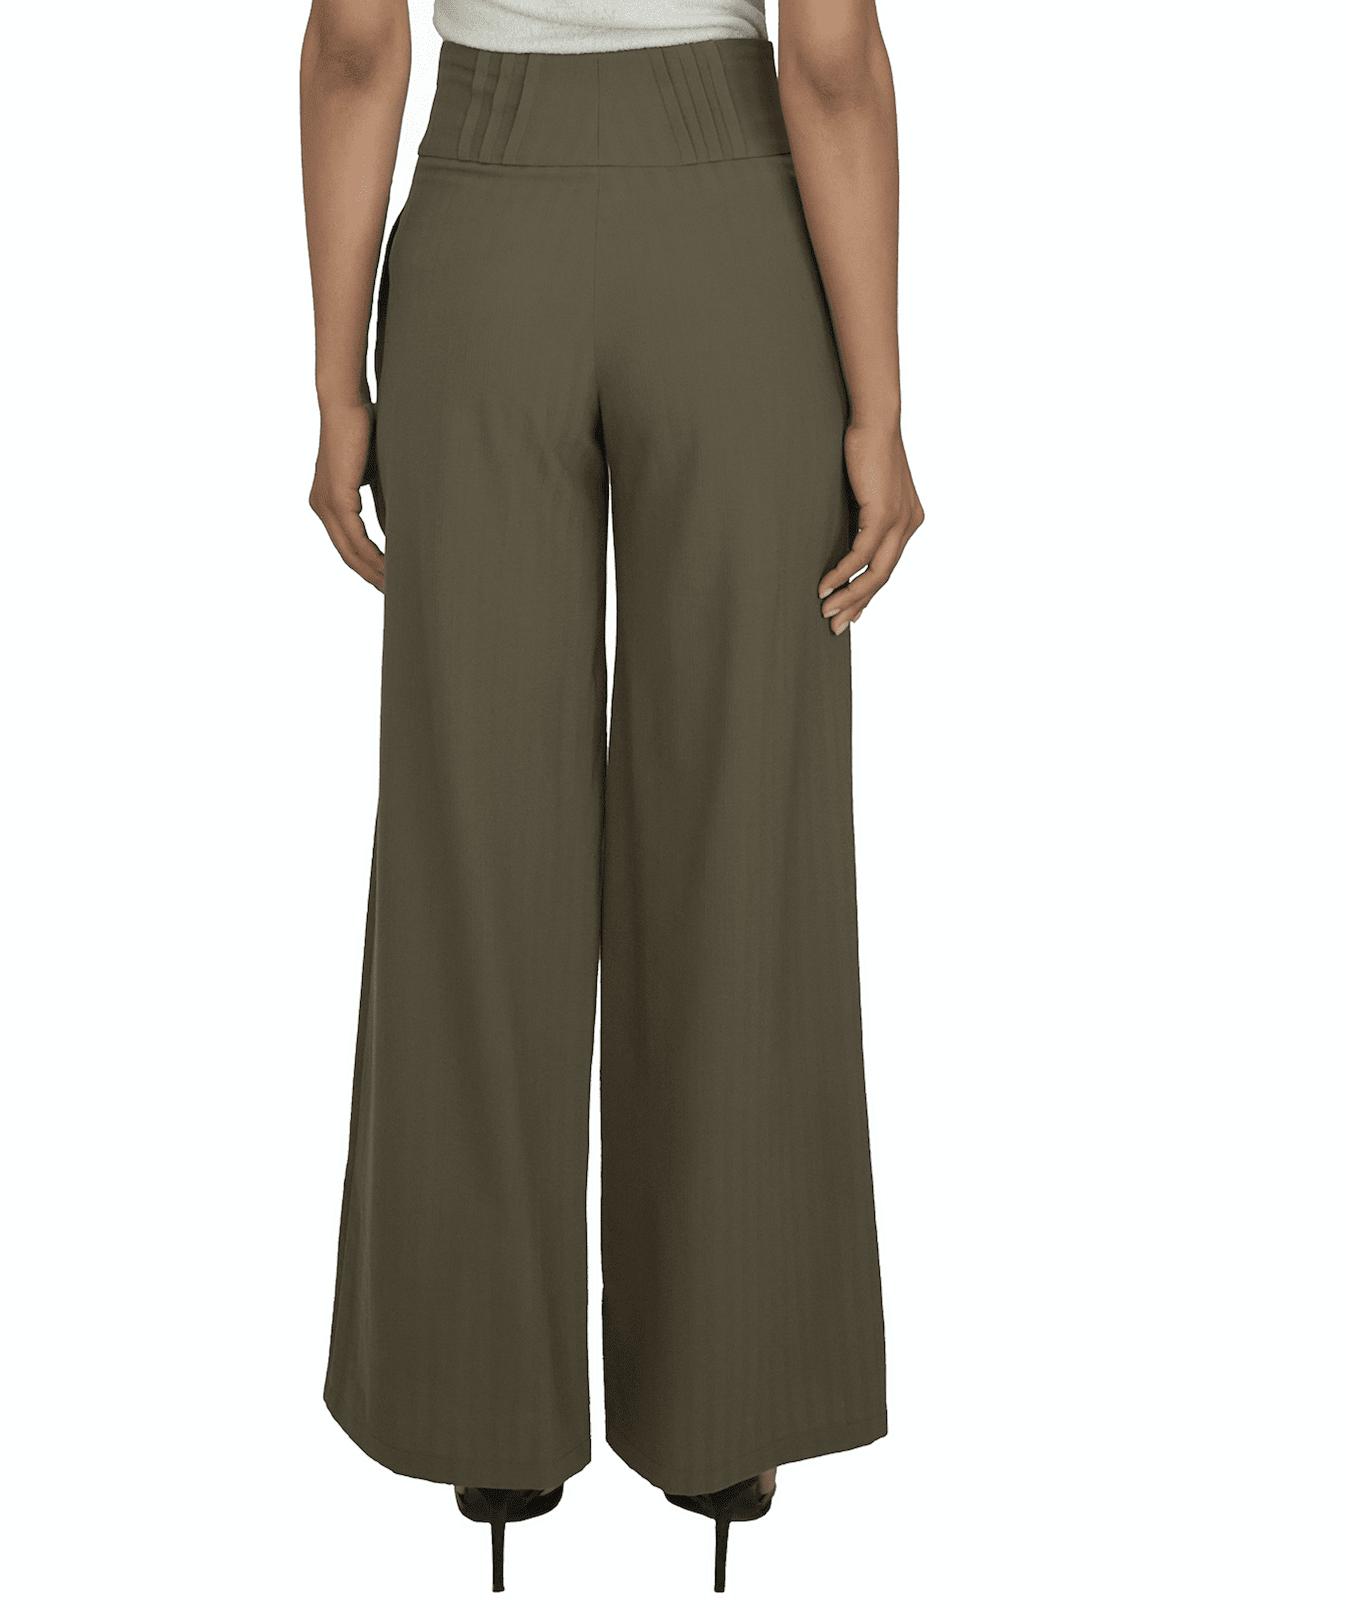 Trousers LIBERTAS 3